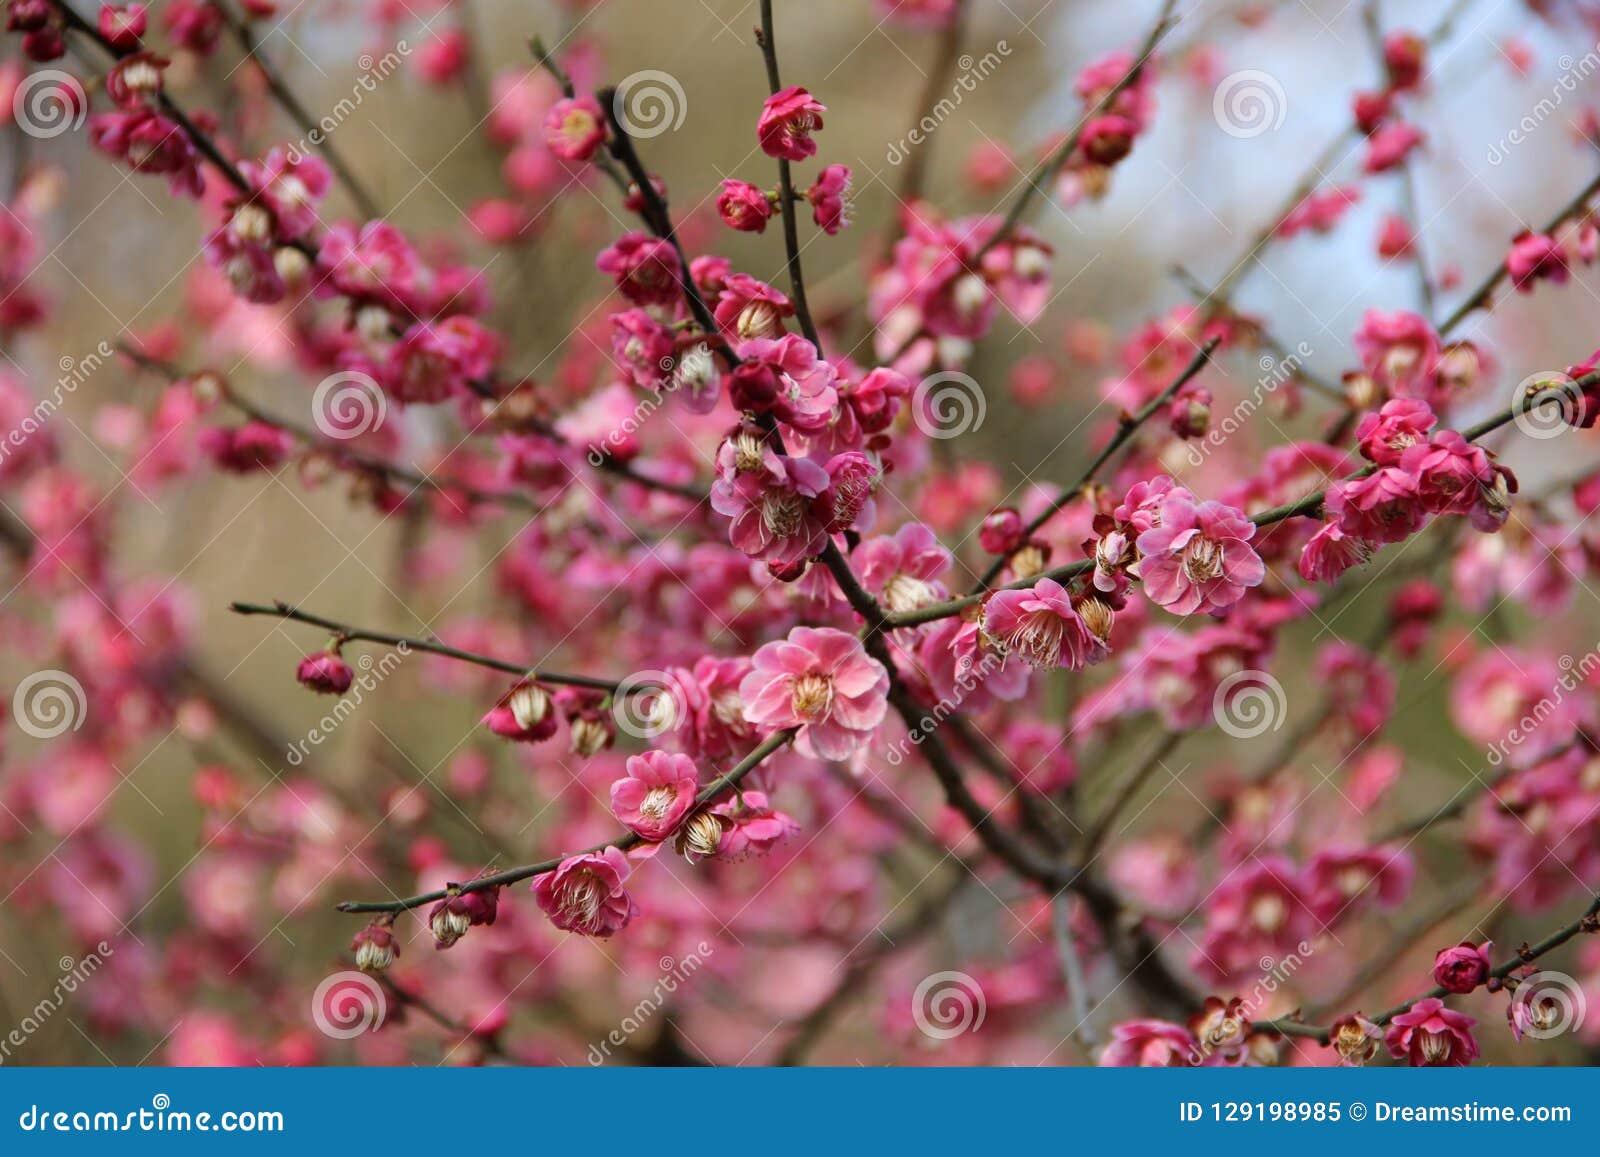 Pflaumenblüte drei